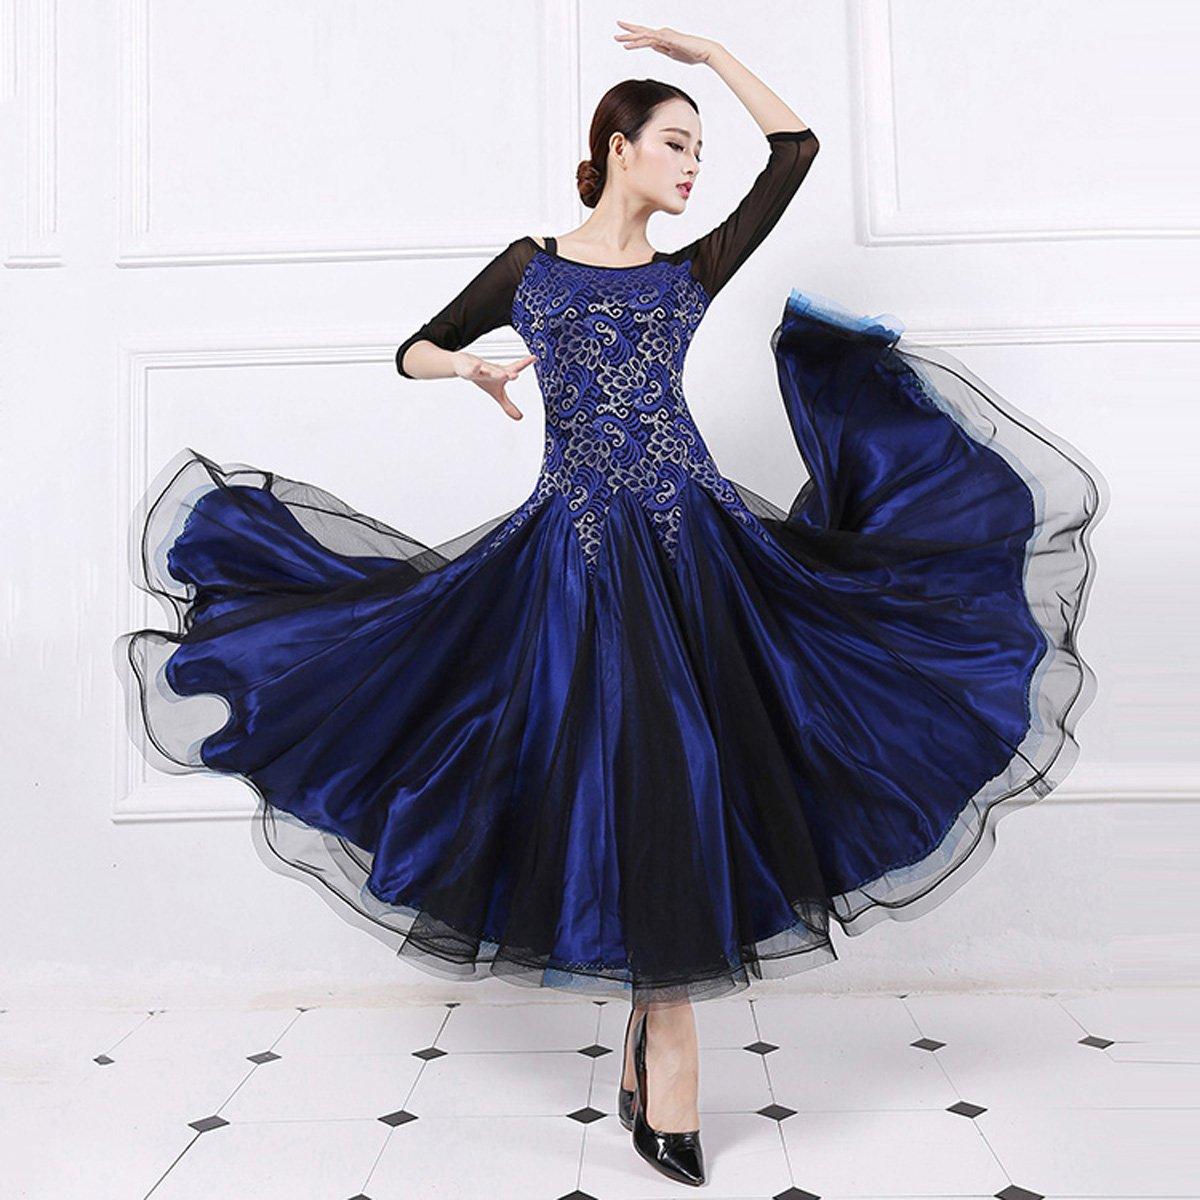 cc85d76380f6 Amazon.com  YC WELL Ballroom Dance Dress Flamenco Waltz Tango Dance Costumes  for Women  Clothing